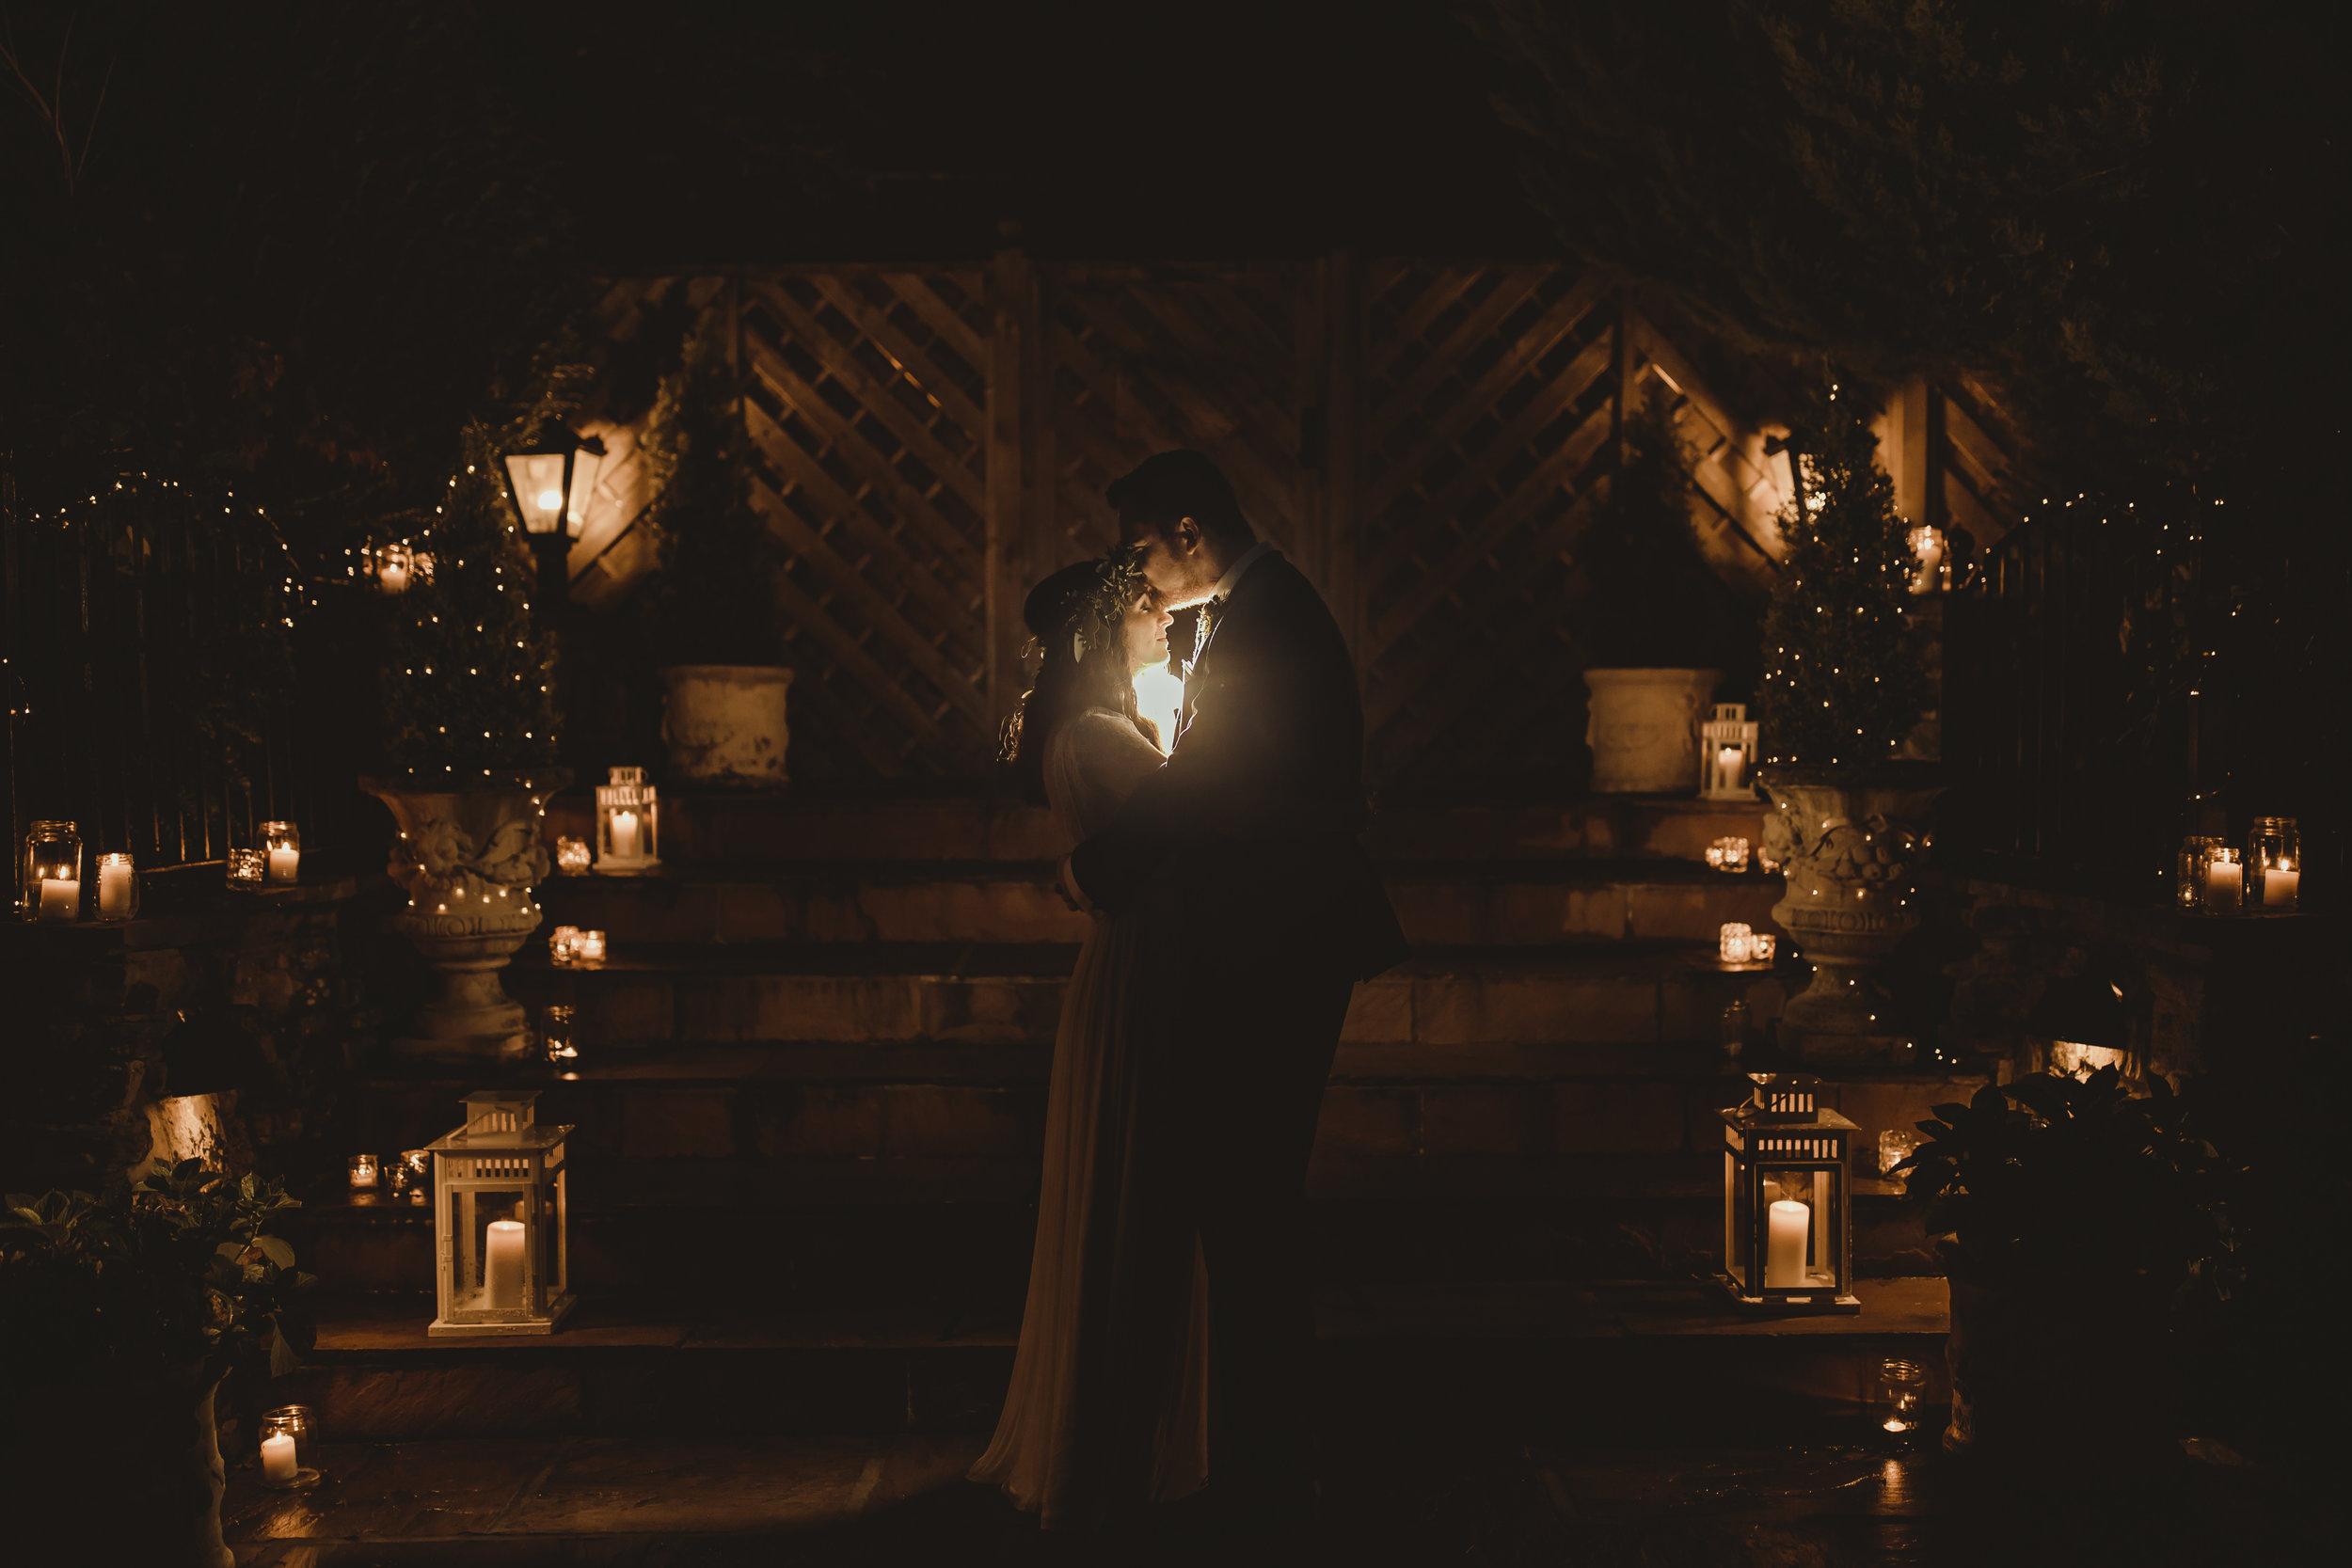 N&J_YORKSHIRE_WEDDING_PHOTOGRAPHER_MALTON_LEEDS_SHEFFIELD-989.JPG